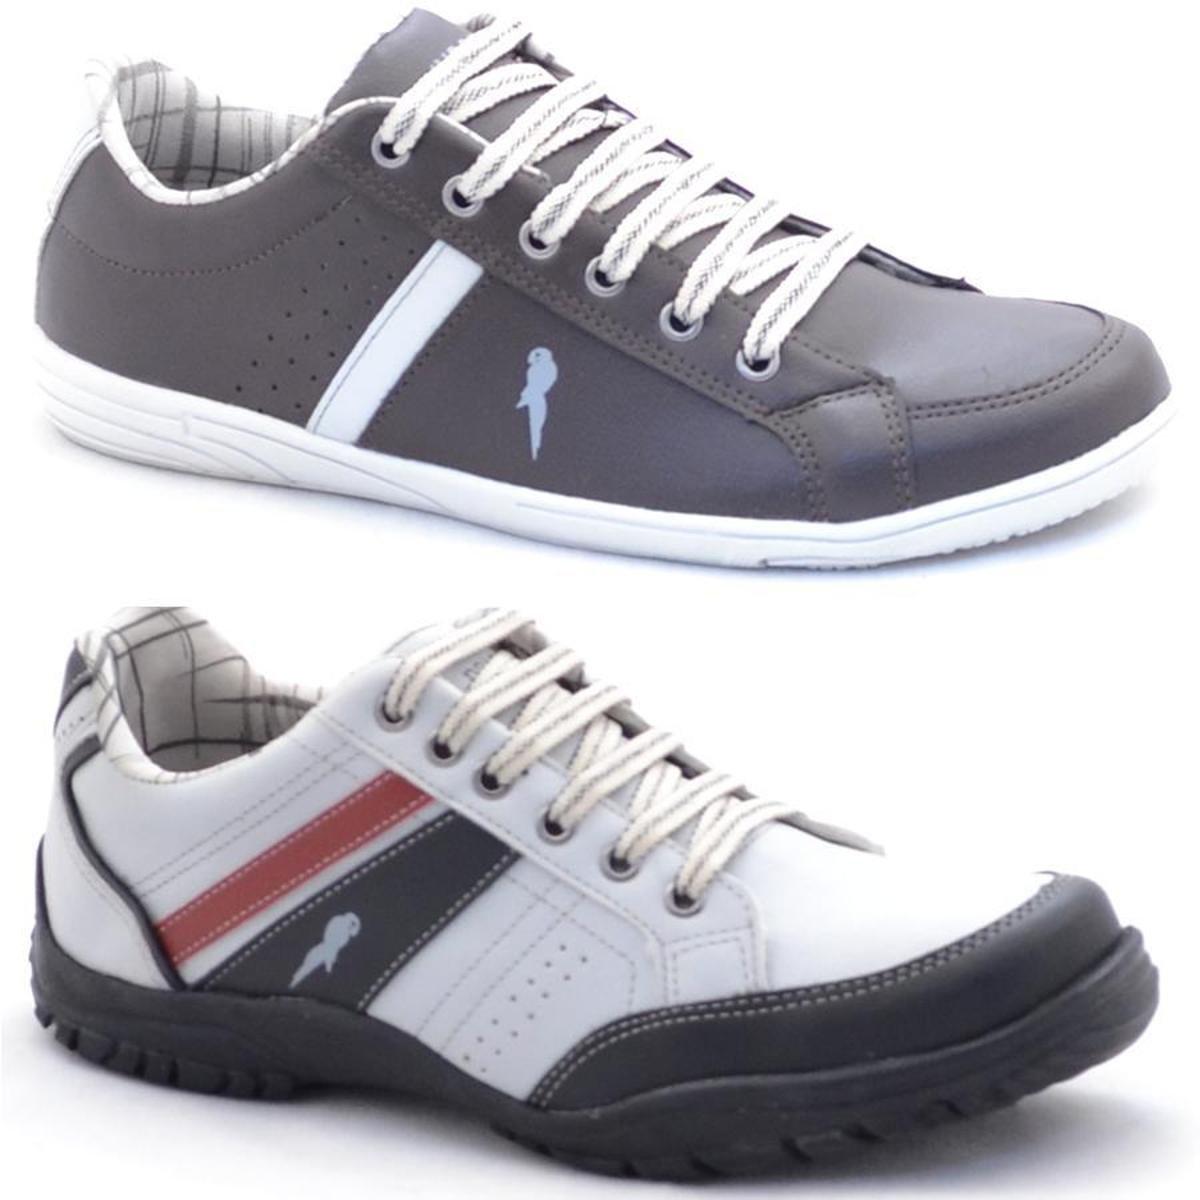 d16cb89dfb1 Kit Sapatênis Polo Blu Casual Masculino - Cinza e Branco - Compre Agora